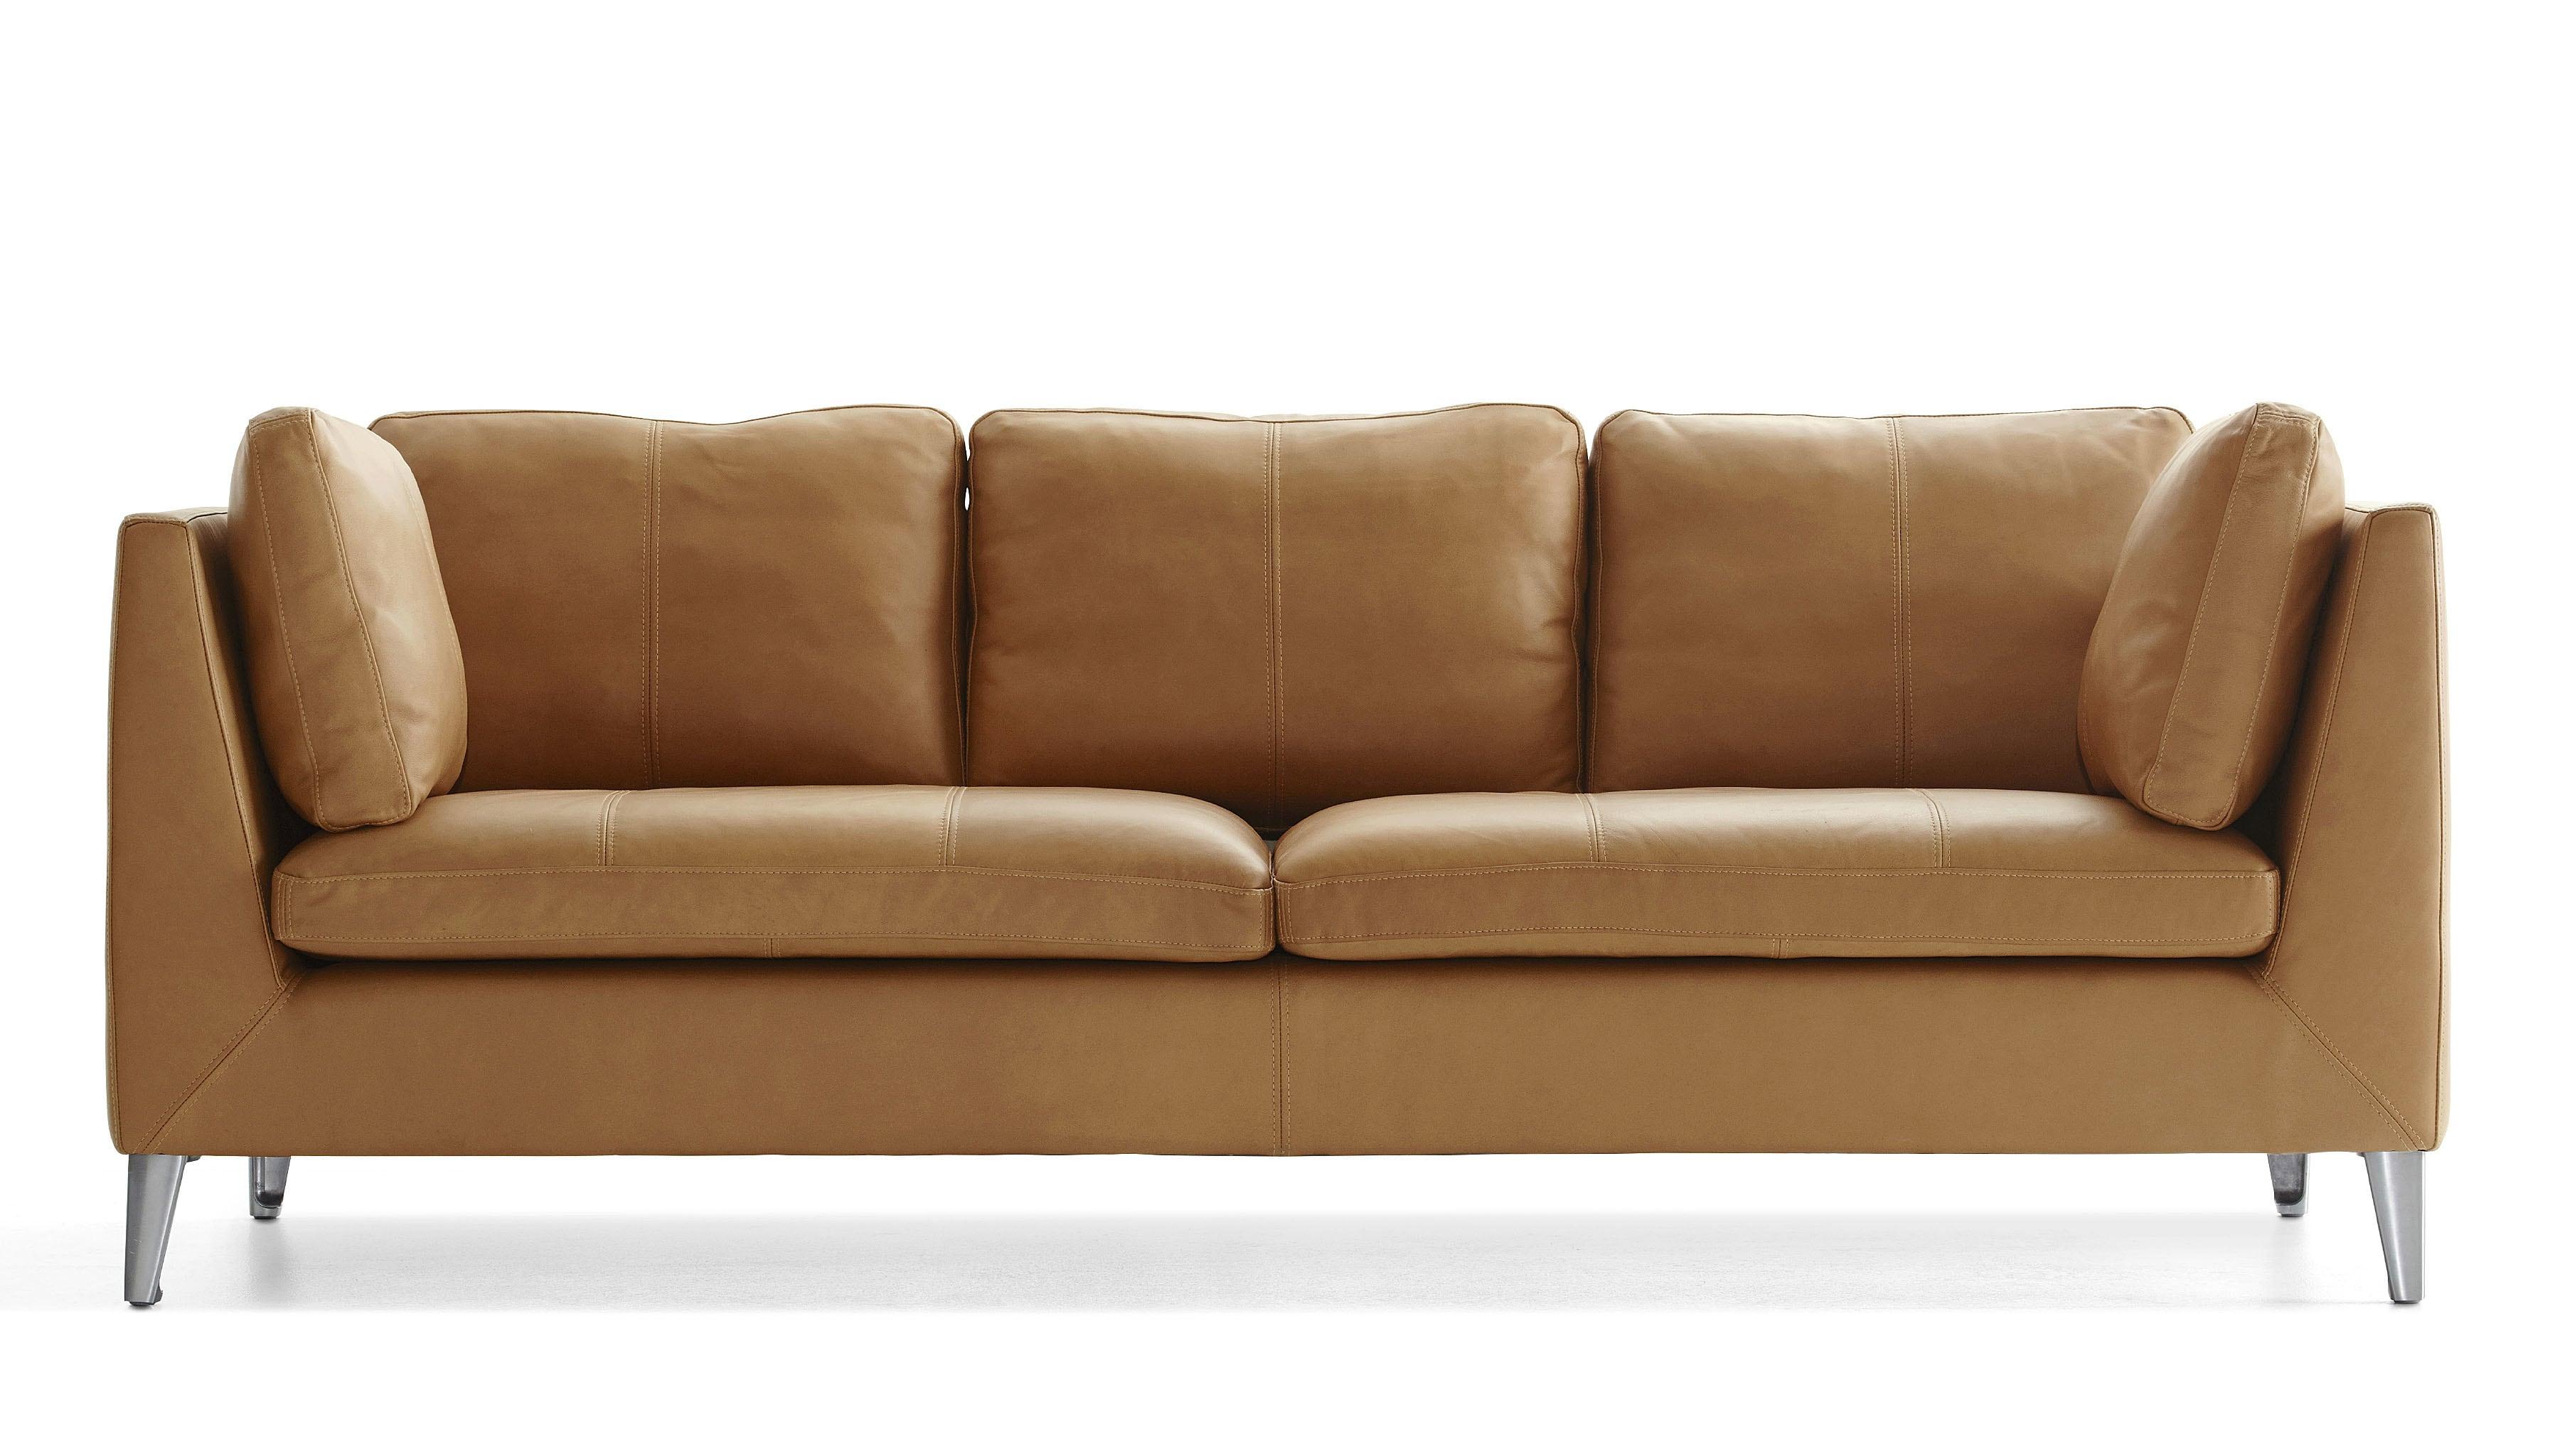 Sillon orejero Conforama Q0d4 sofà S Y Sillones Pra Online Ikea